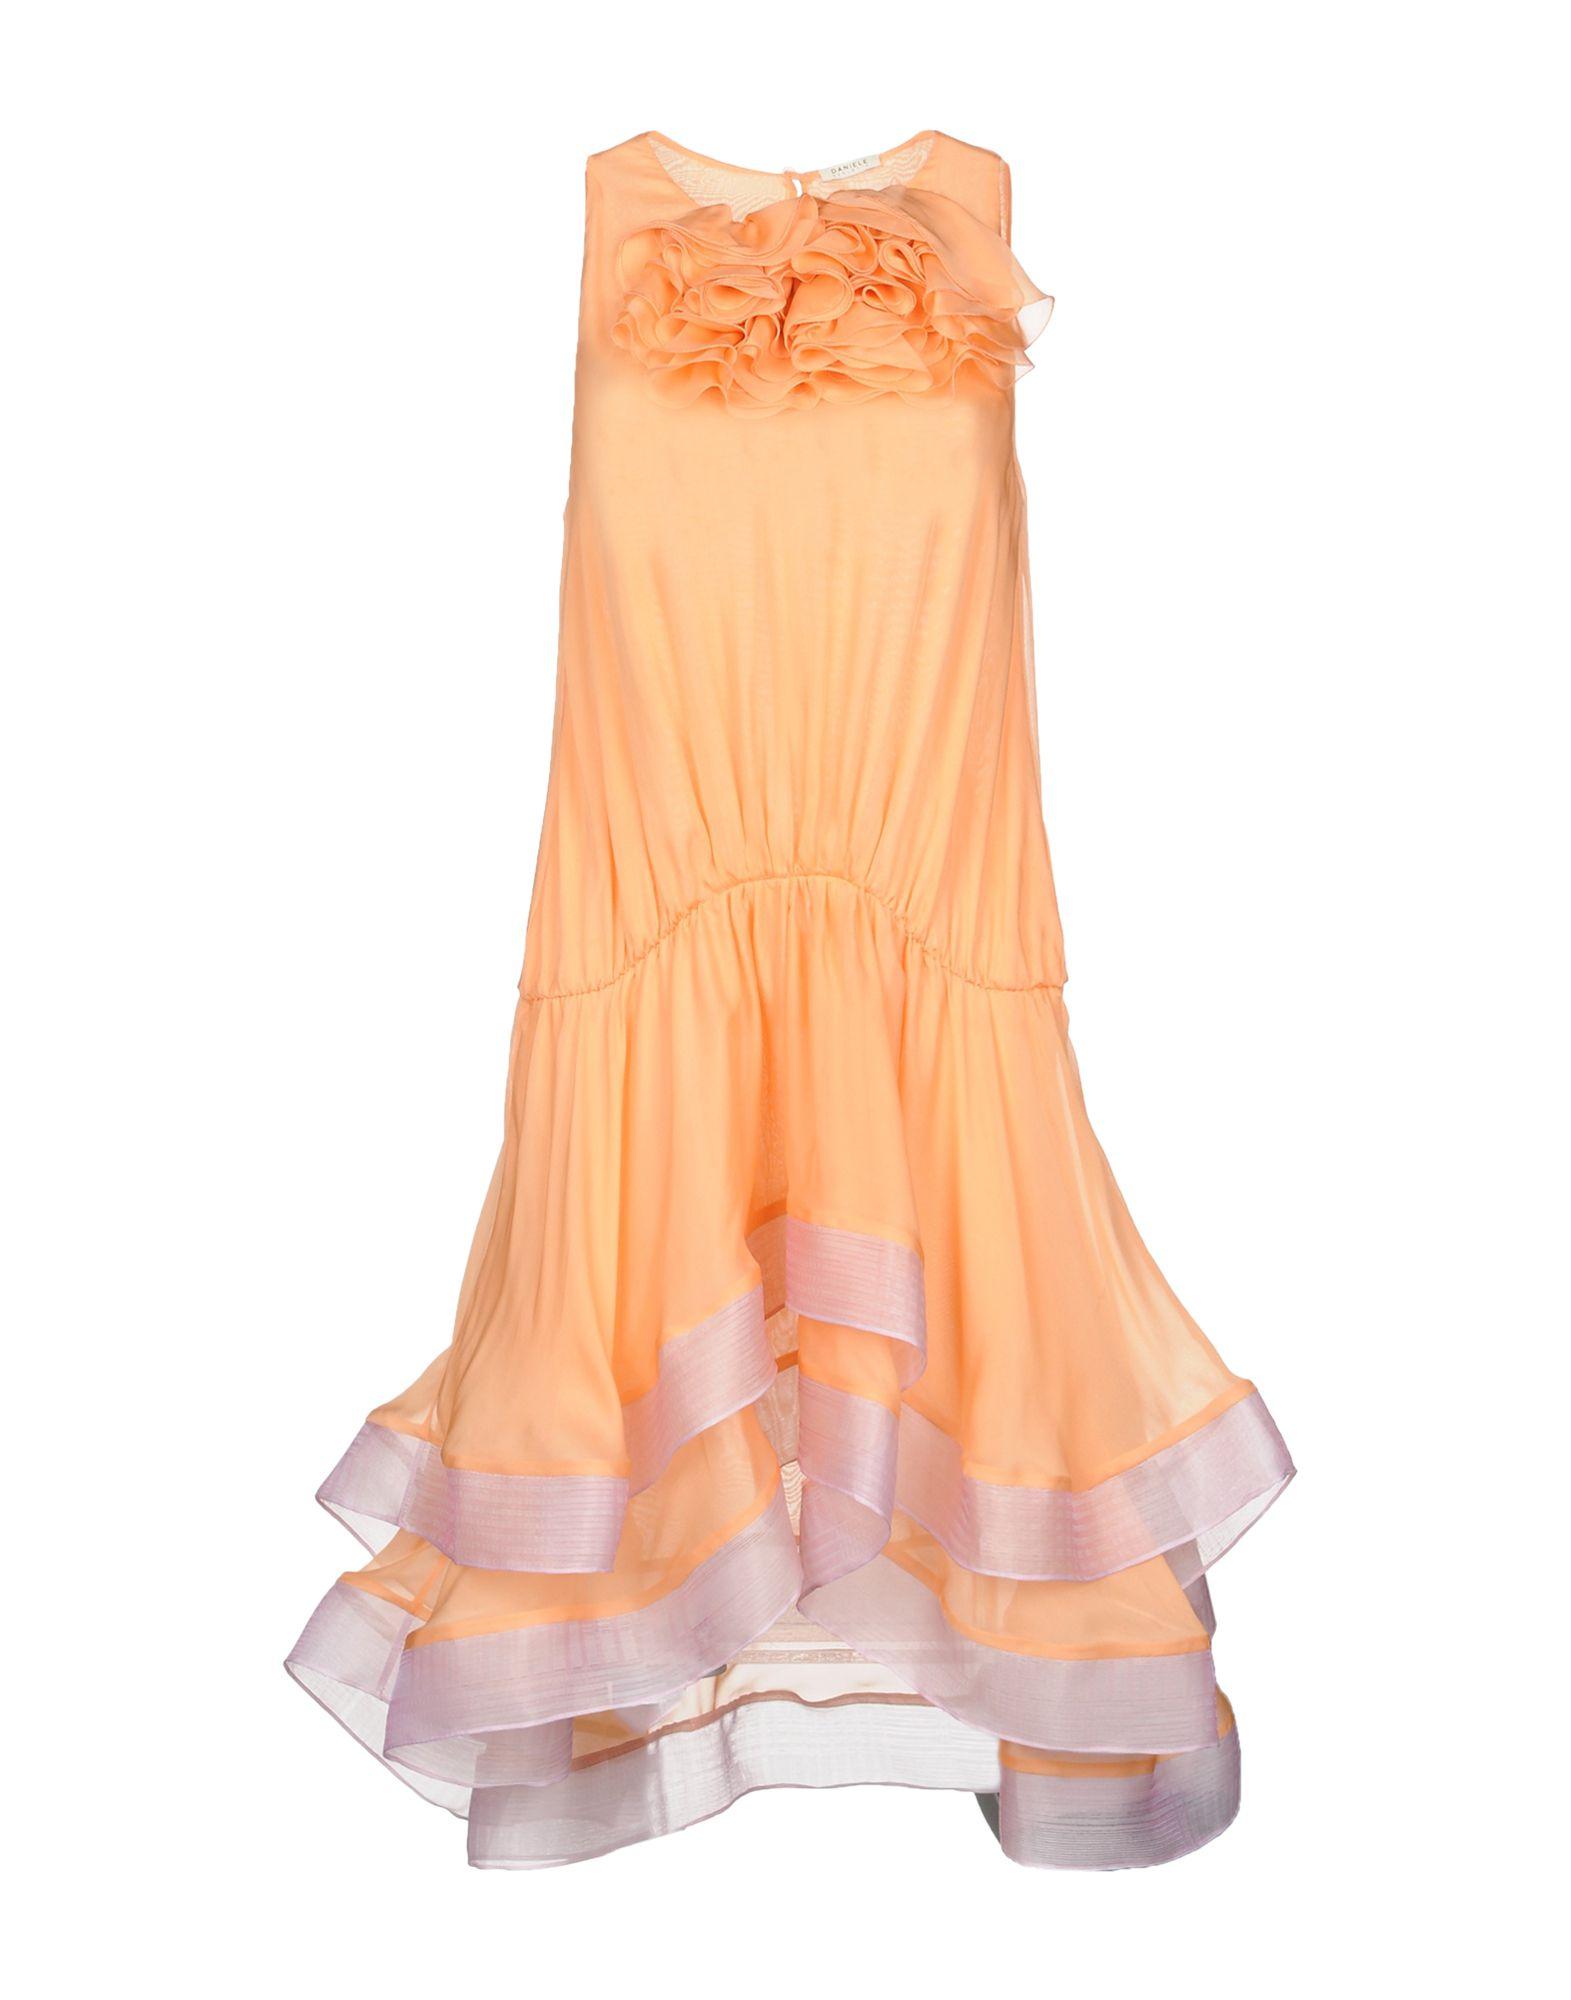 DANIELE CARLOTTA Short Dress in Apricot